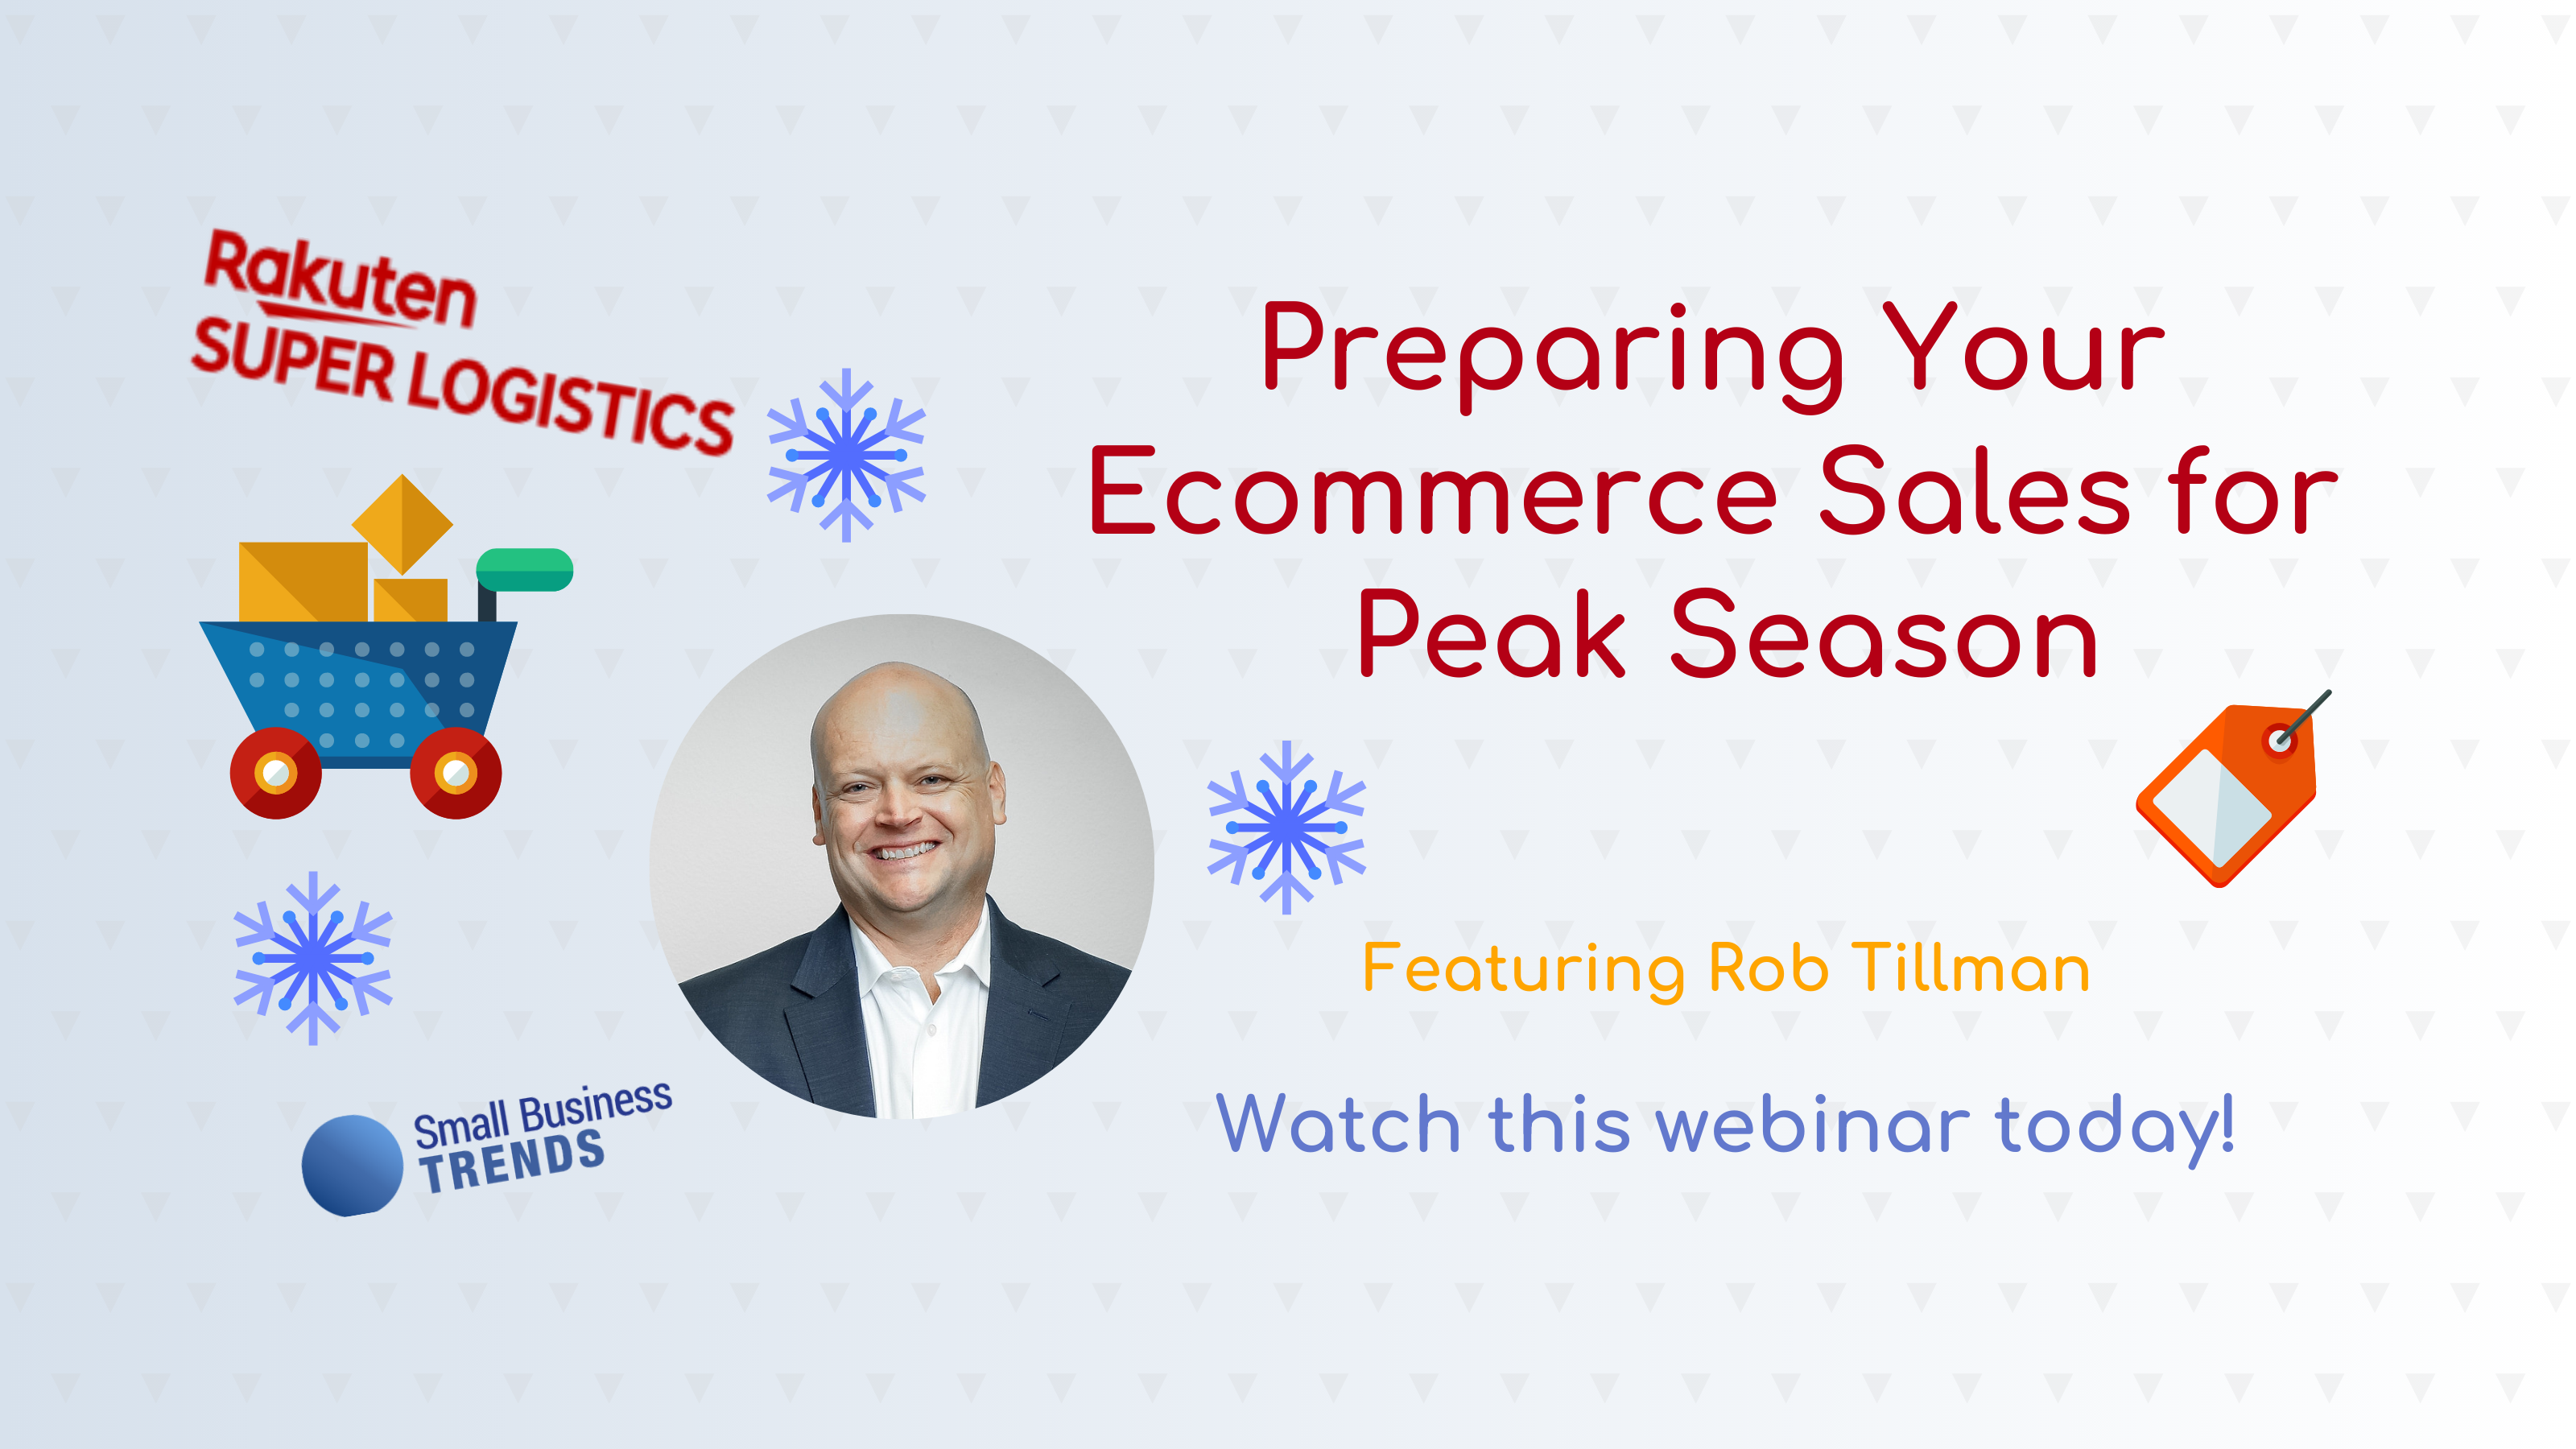 Free Webinar: Preparing Your Ecommerce Sales for Peak Season and Beyond